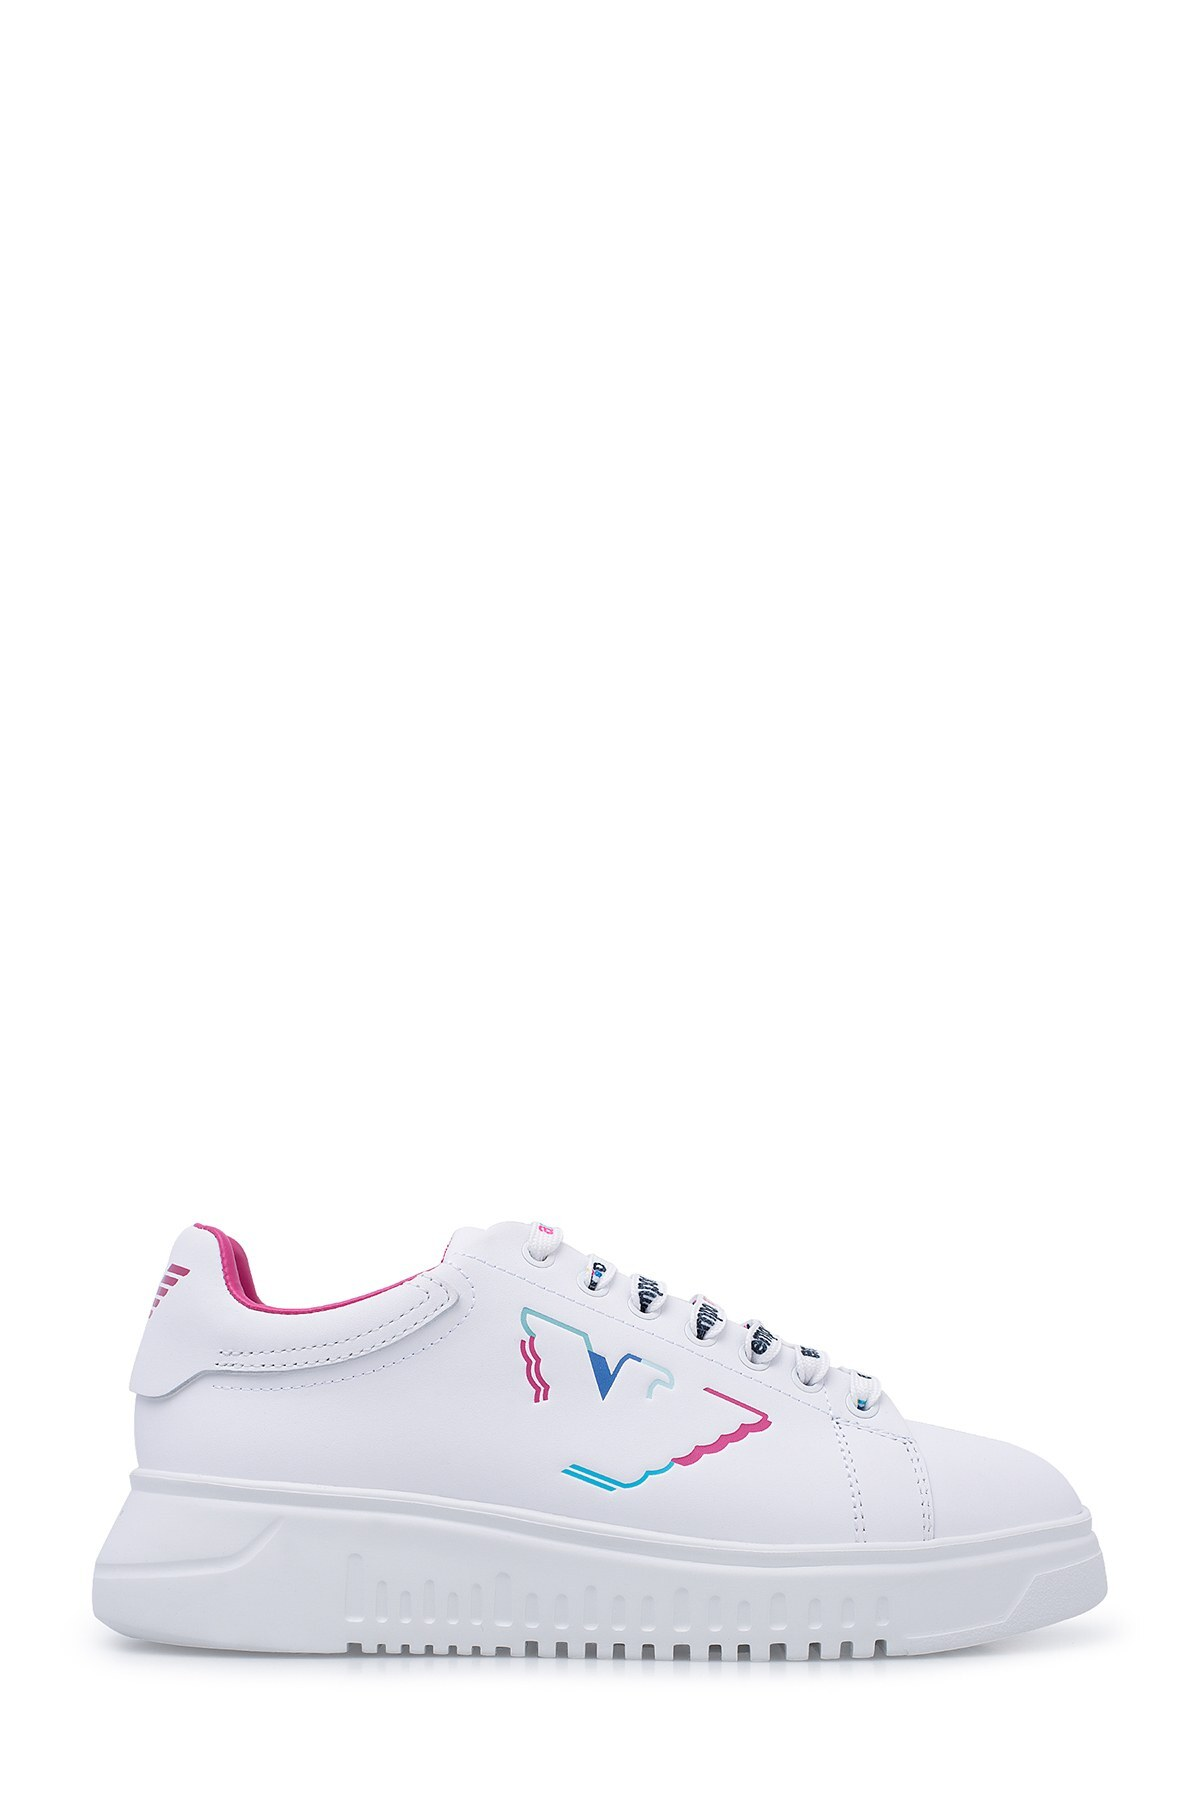 Emporio Armani Kadın Ayakkabı X3X024 XM270 R740 BEYAZ